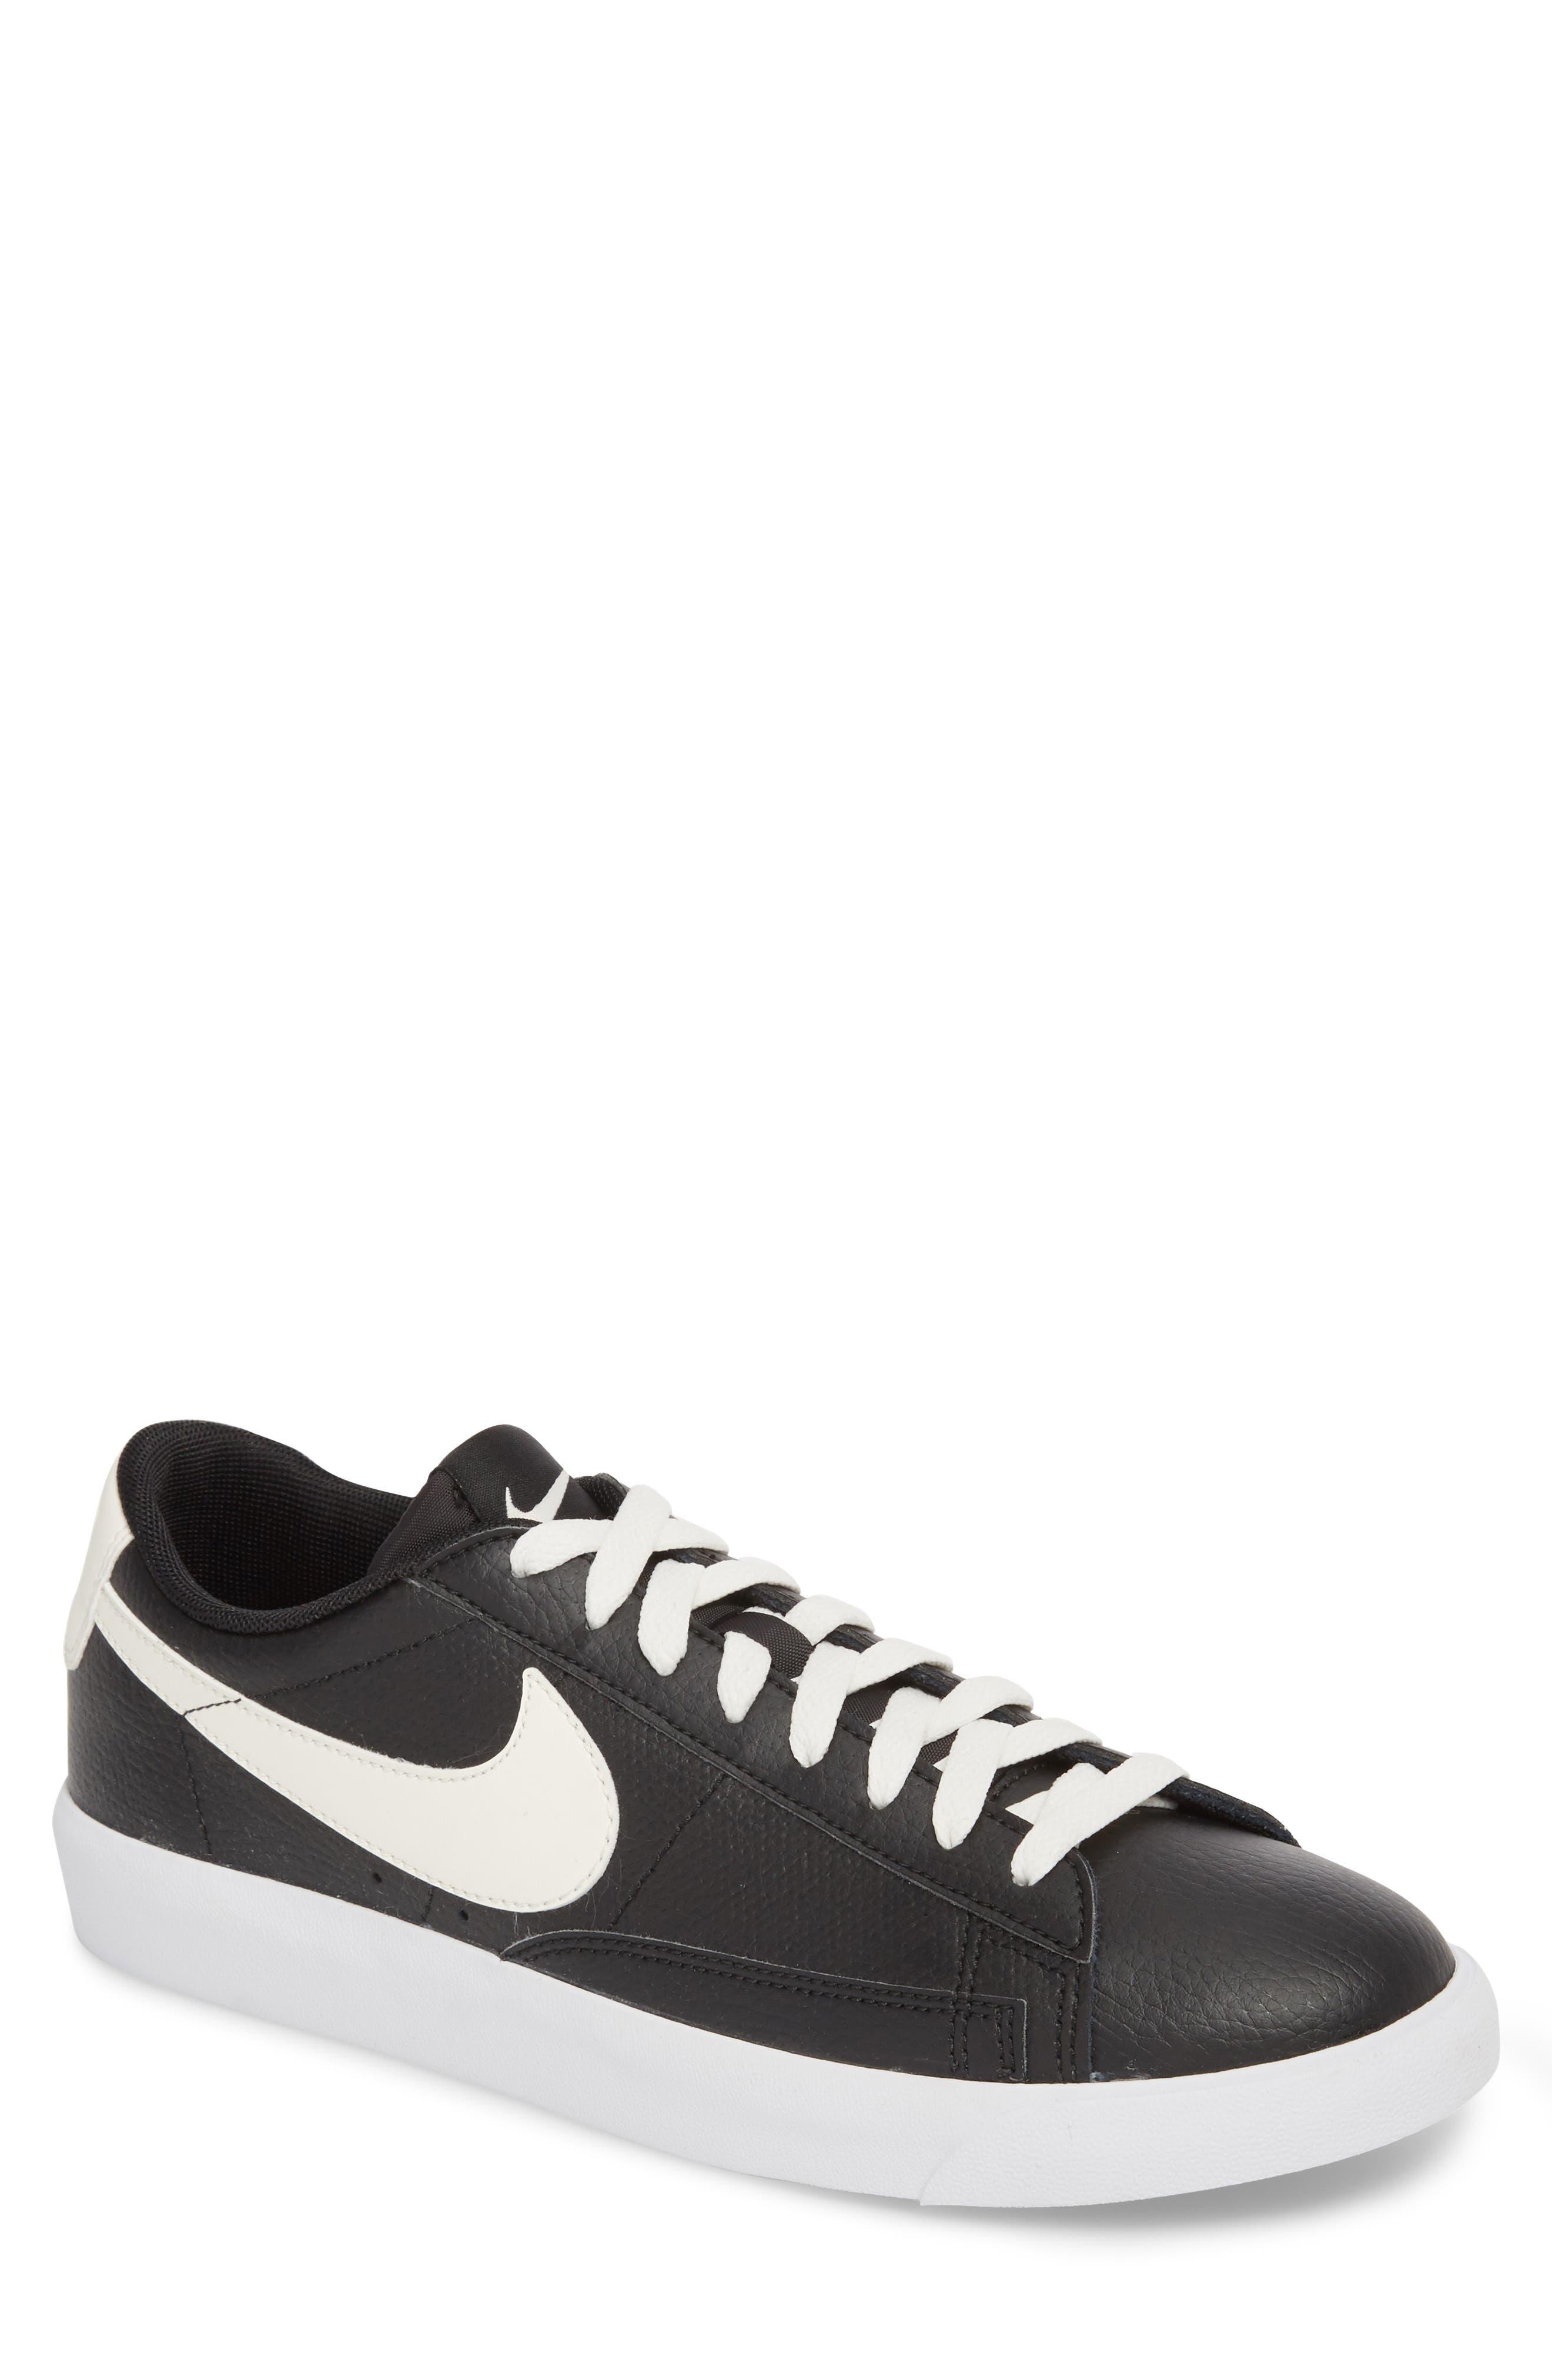 Blazer Low Leather Sneaker,                         Main,                         color, Black/ Sail